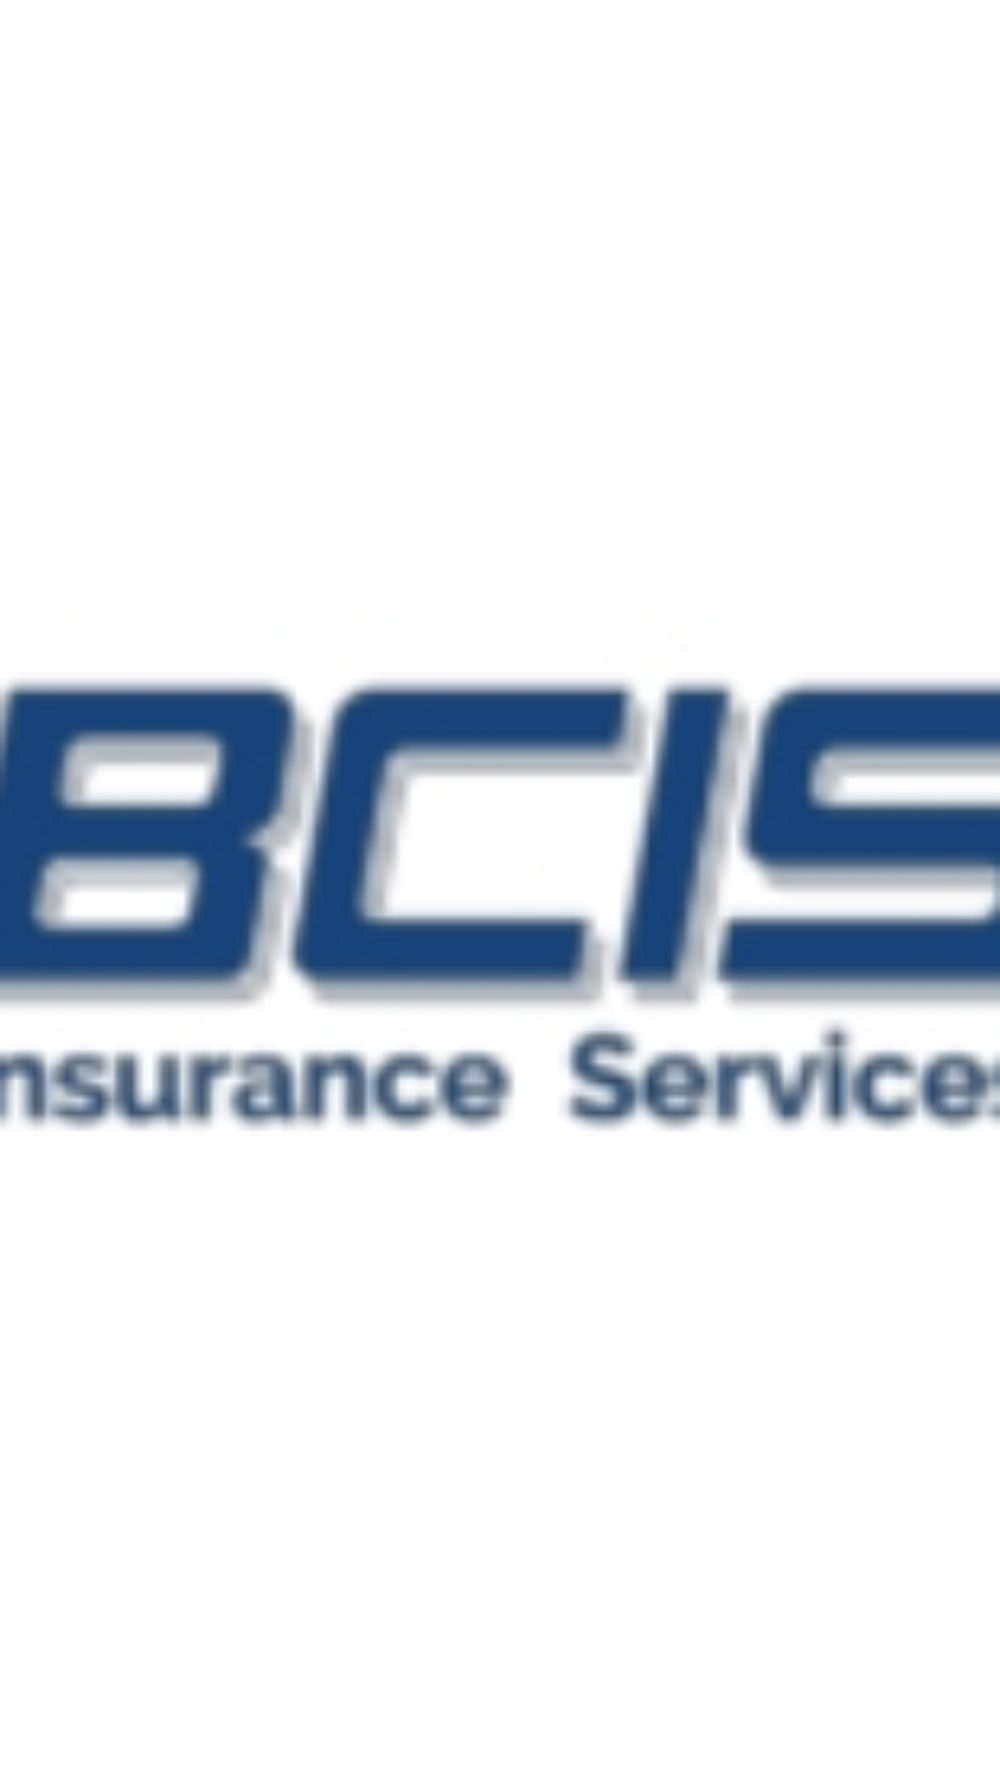 BCIS-Insurance